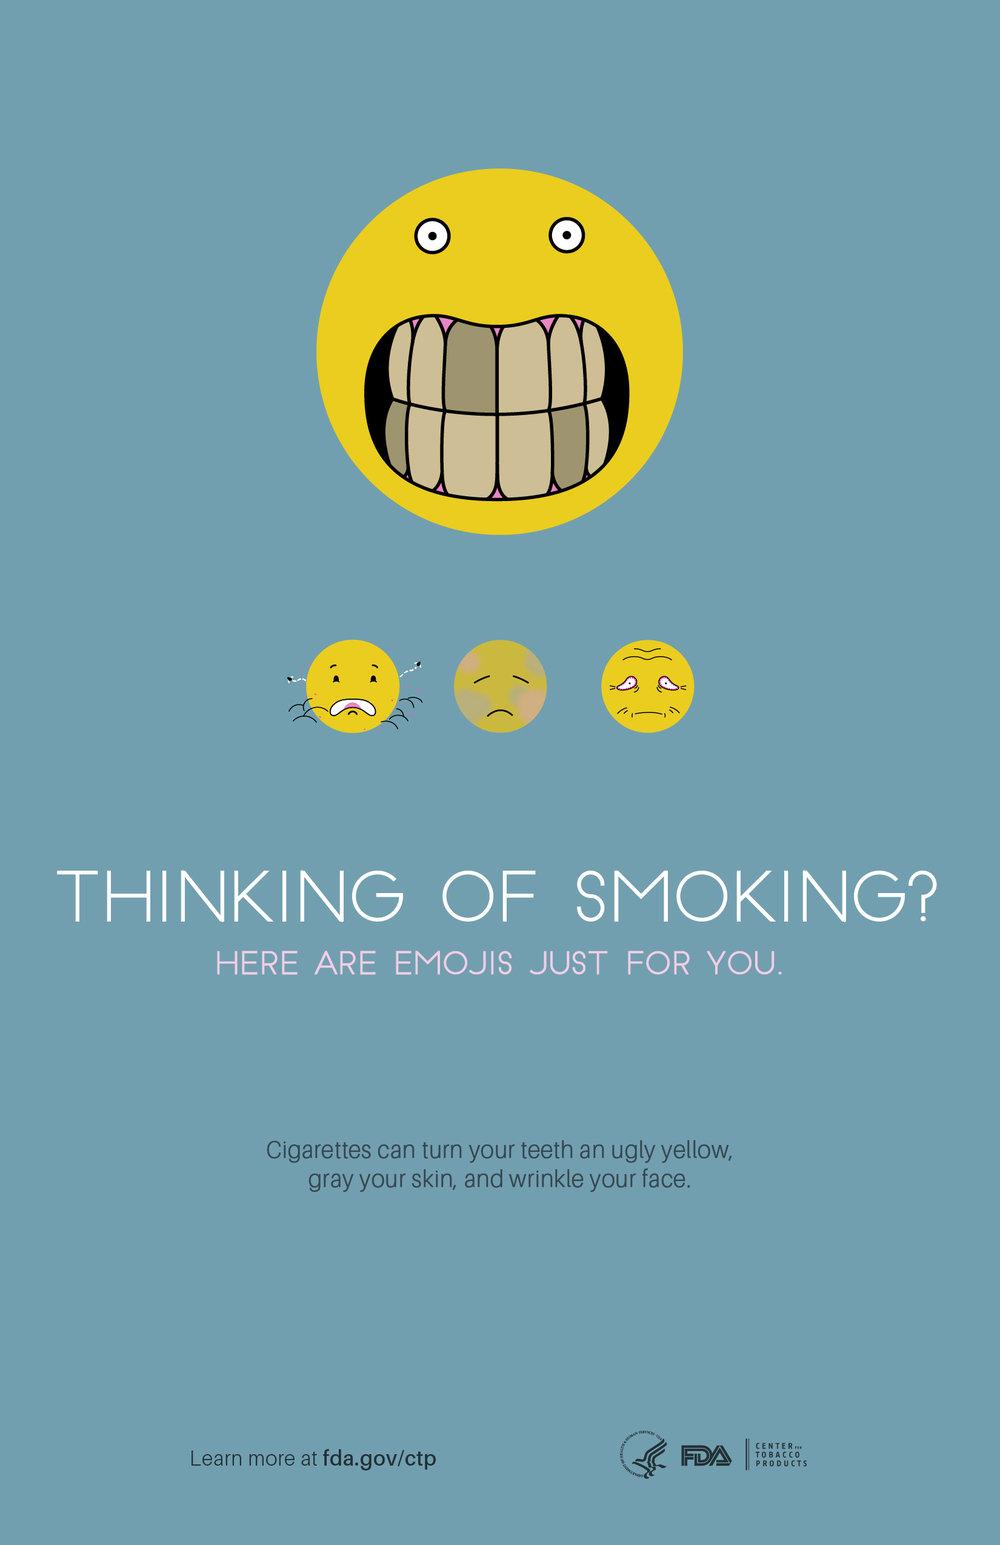 FDA_CTP_Emoji_Cosmetic_v17.jpg